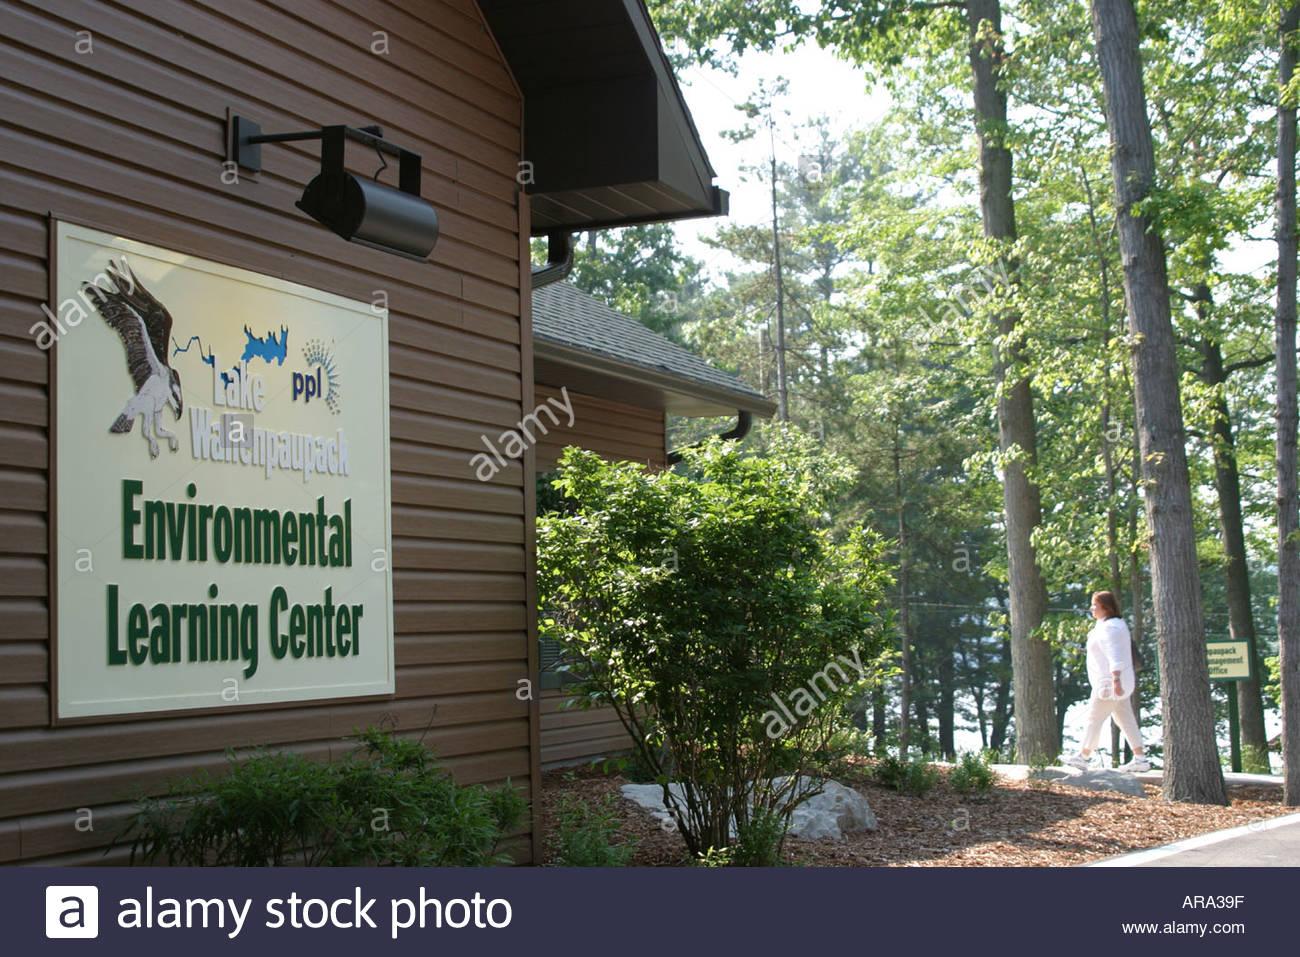 Pennsylvania Pocono Mountains Lake Wallenpaupack Environmental Center